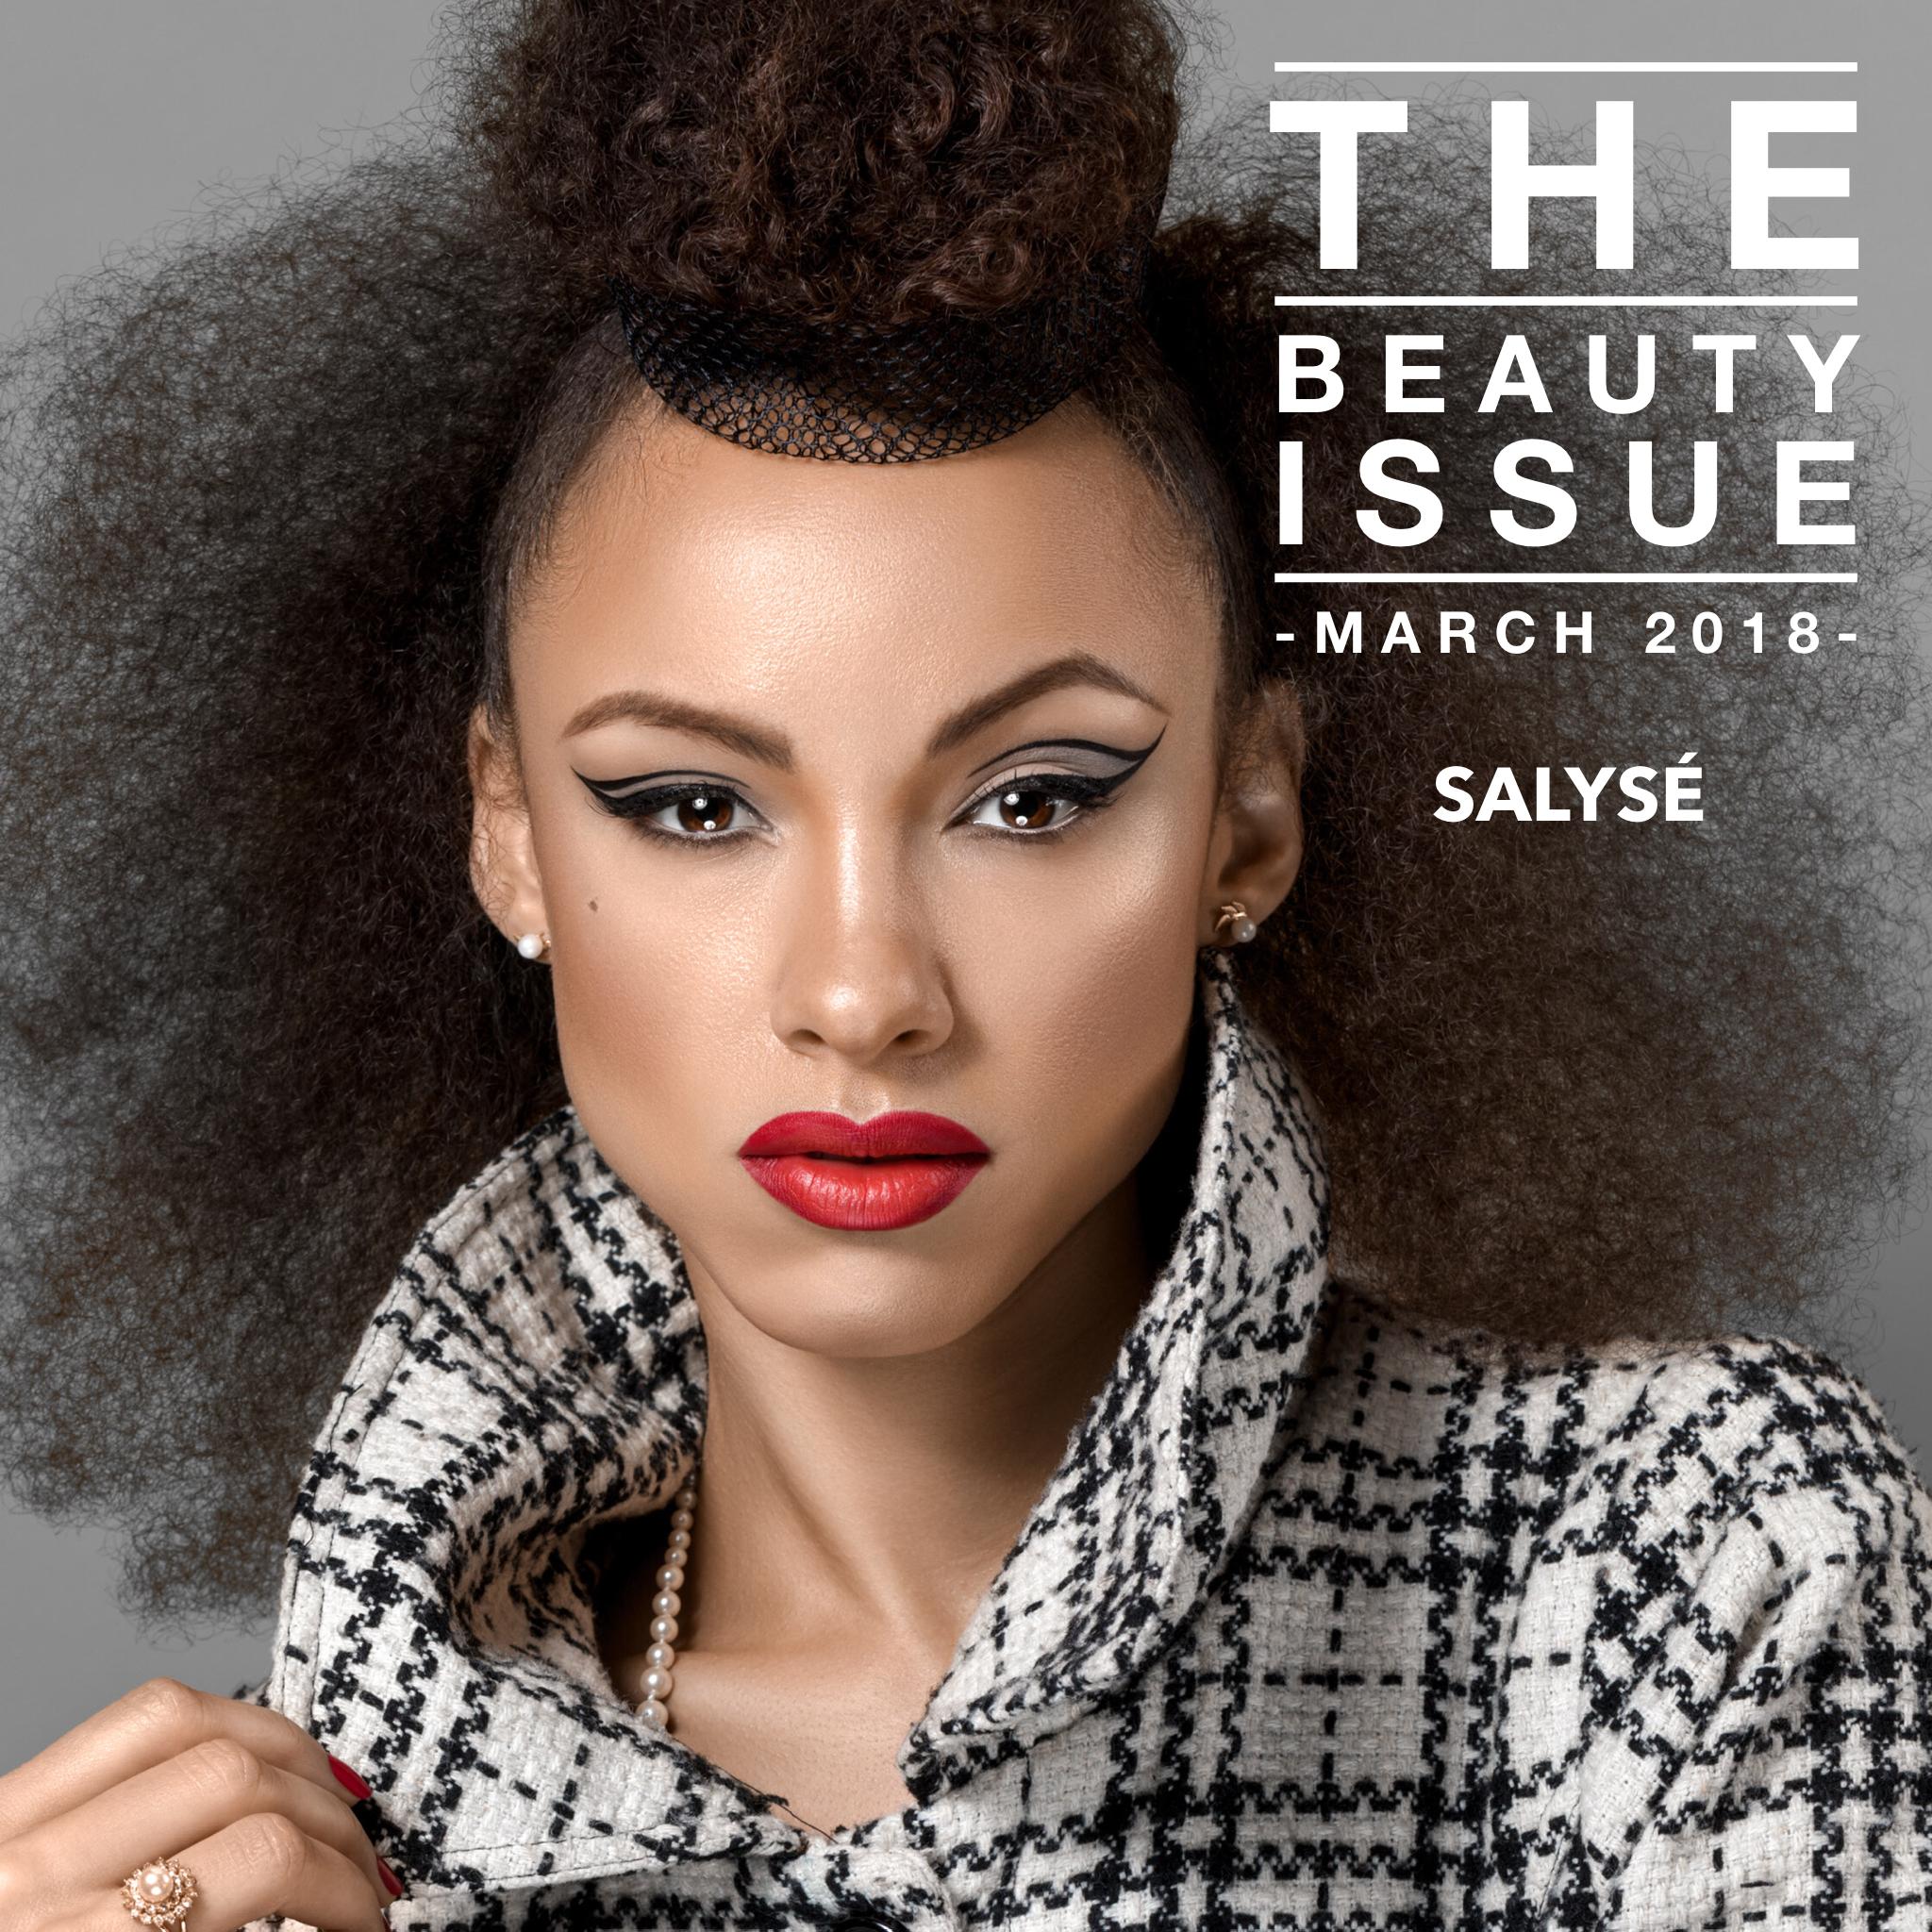 Photographer: Alexandre Bui; Model: Tiffany Marie; MUA: Karl Sanchez; Hair Stylist: Jan